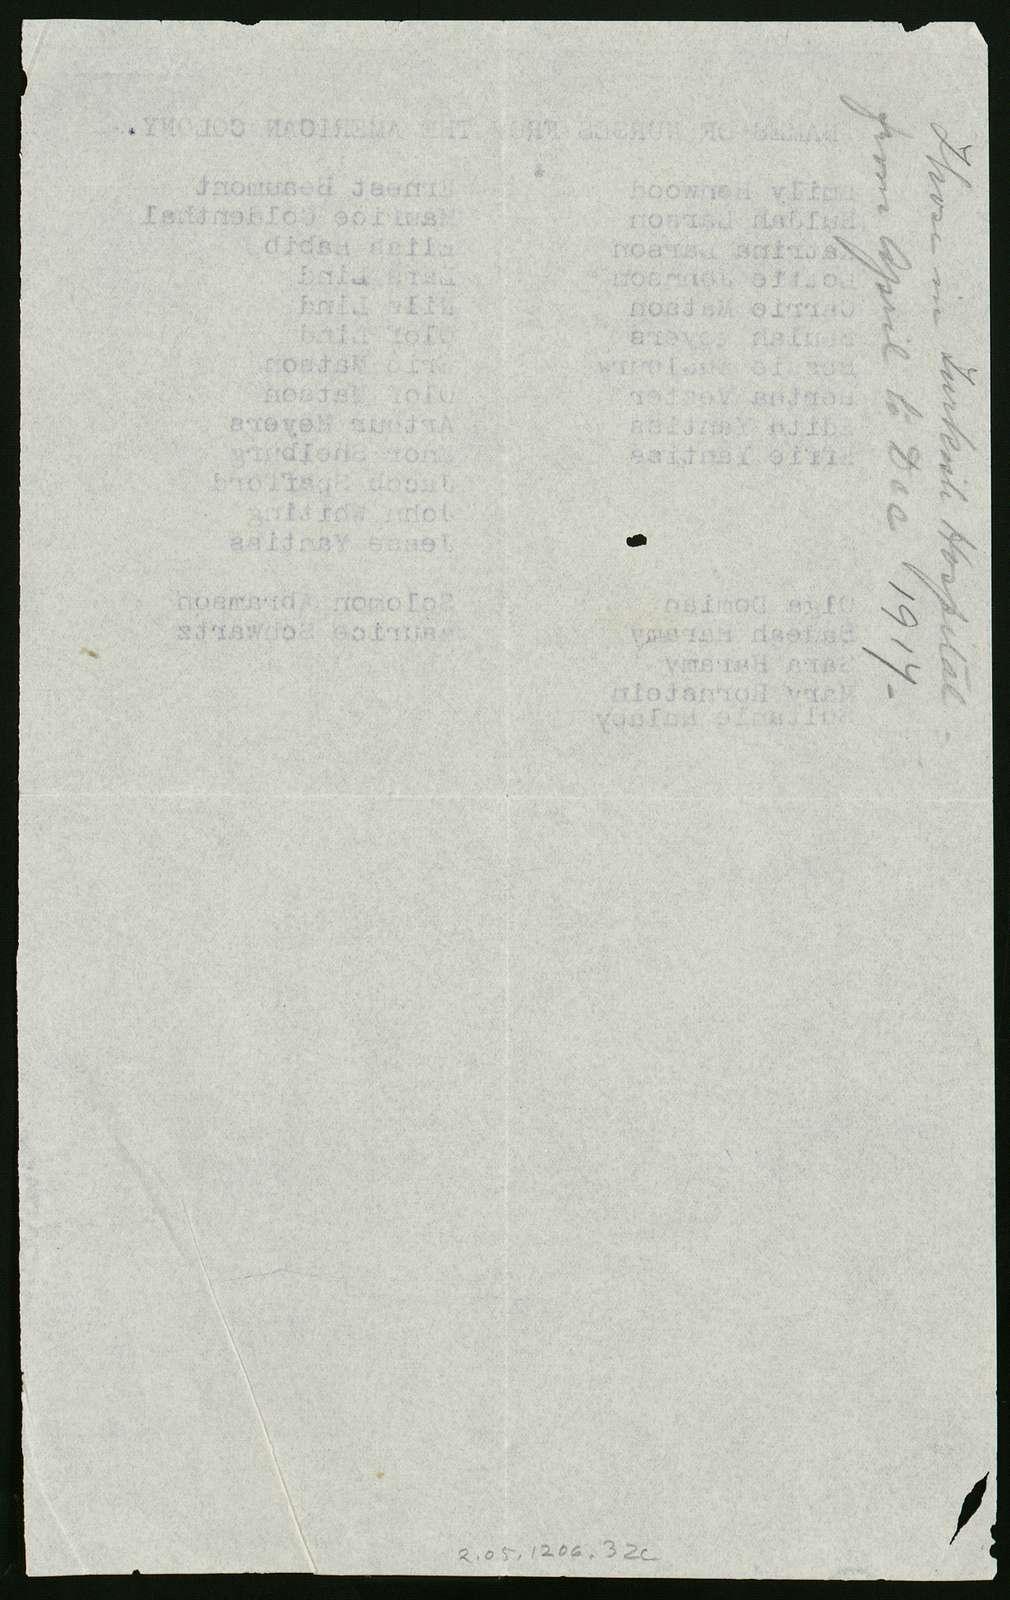 List of names of American Colony Nurses, World War I, Jerusalem